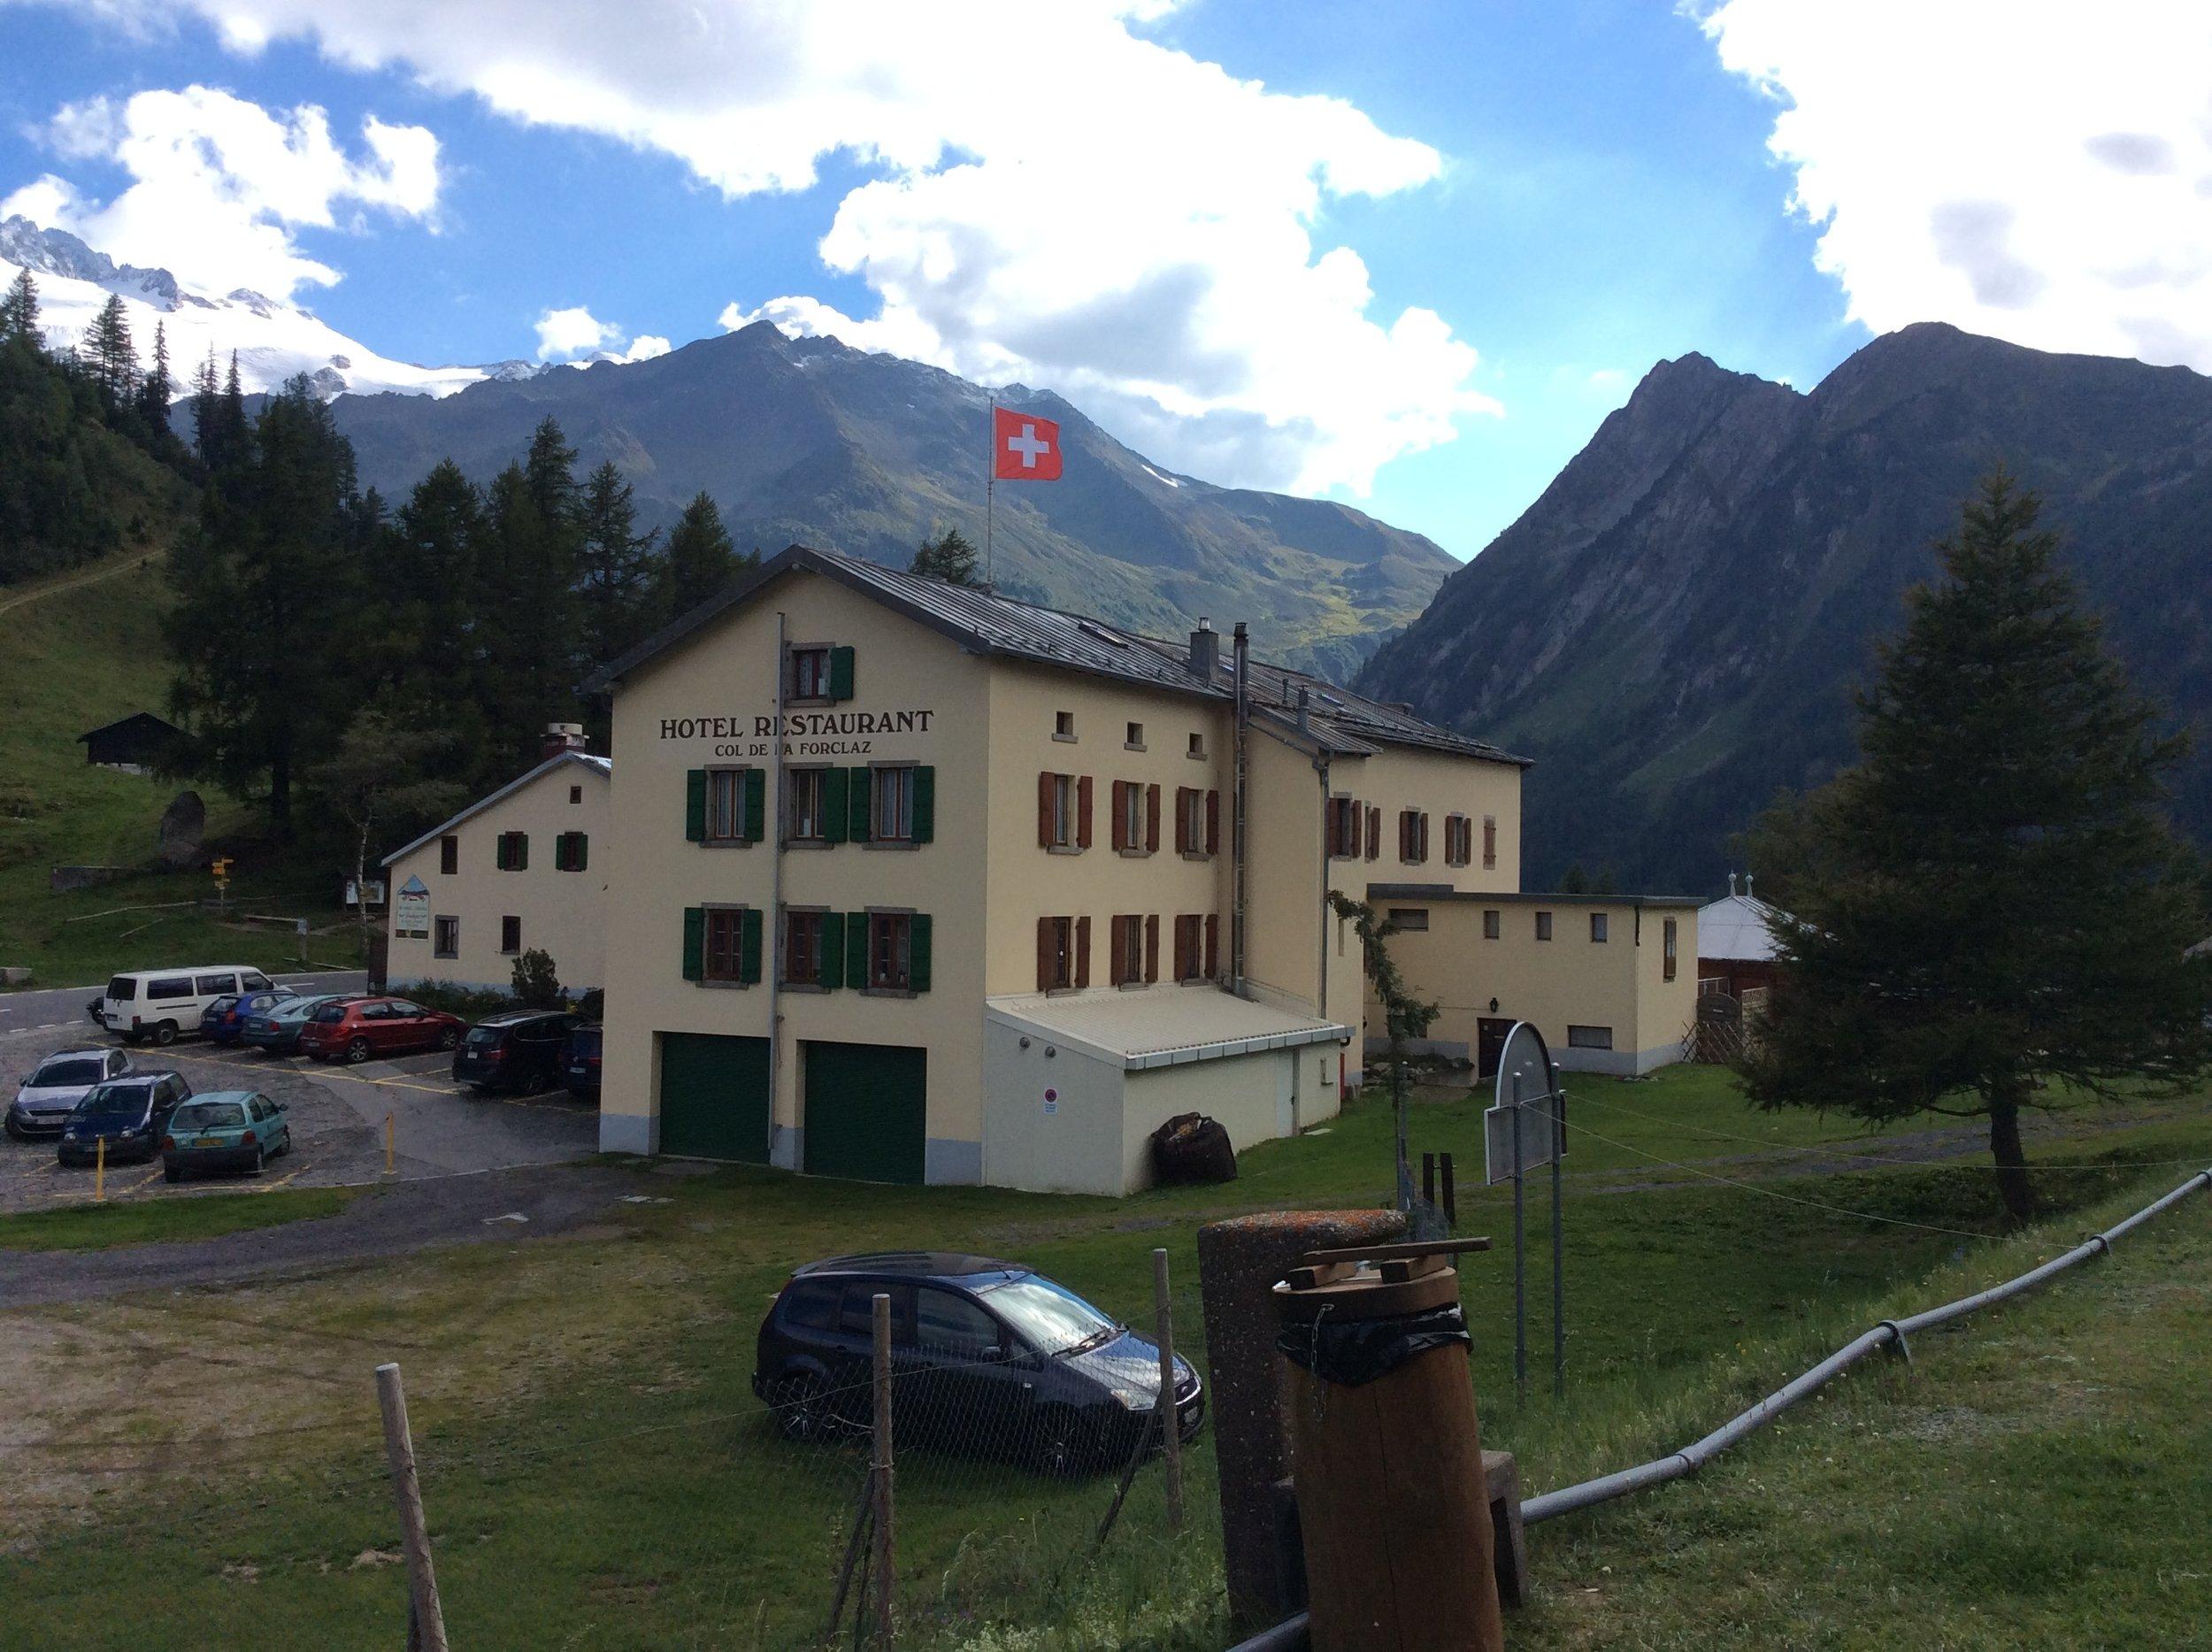 Hotel de la Forclaz from the campsite